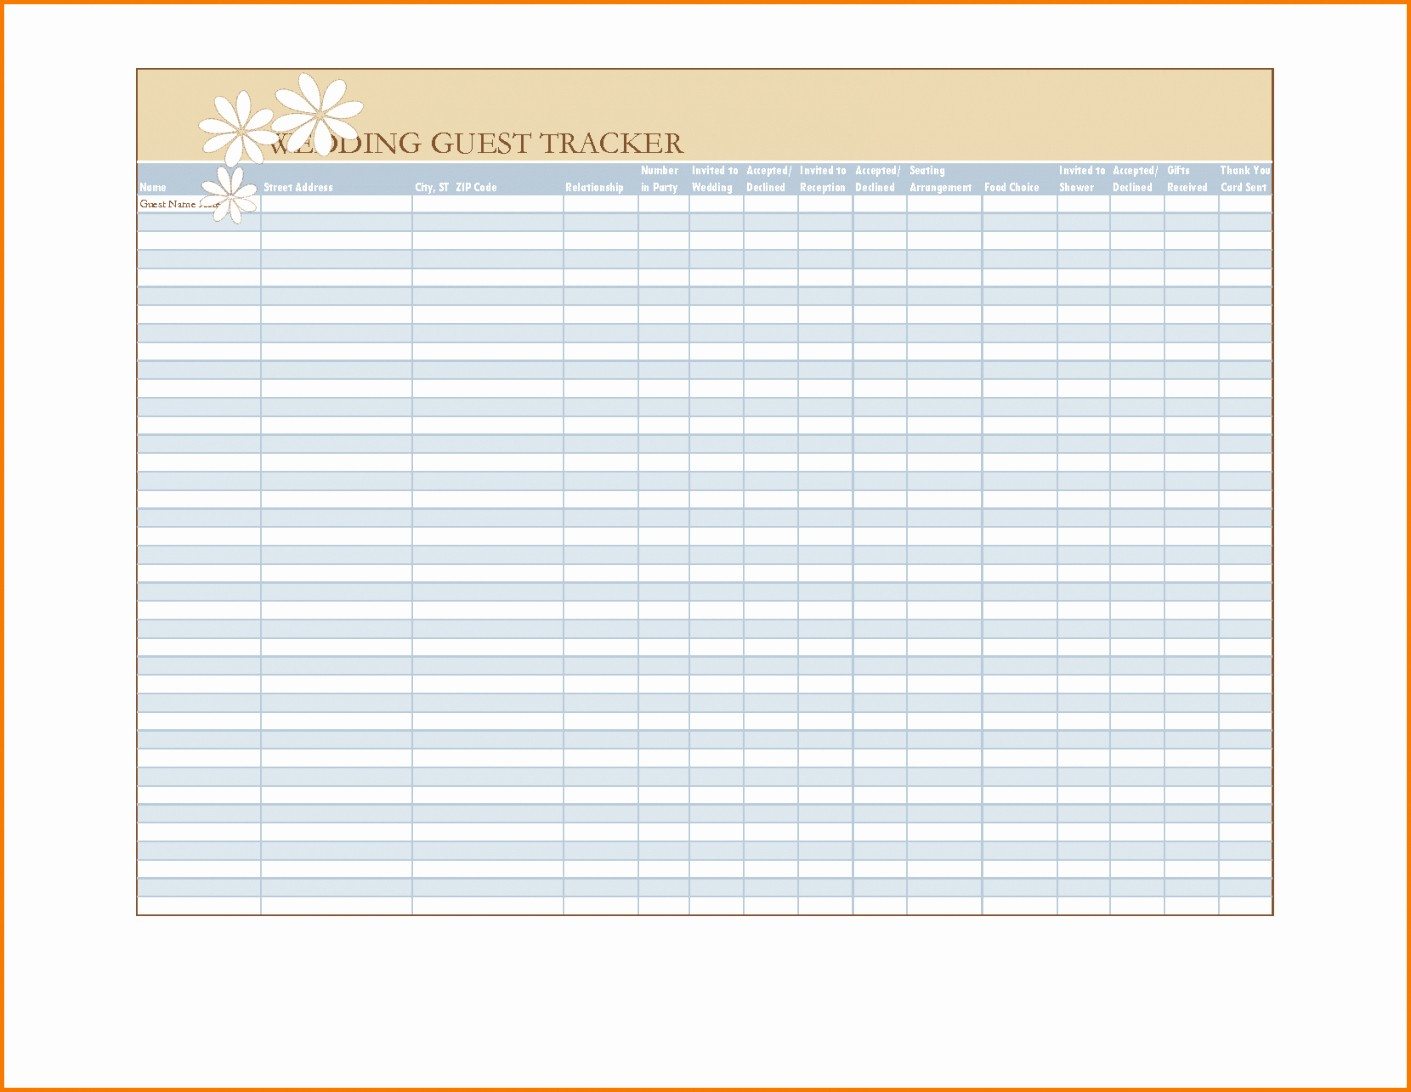 Wedding Guest List Spreadsheet Excel Best Of Downloadable Wedding Guest List Spreadsheet Imzadi